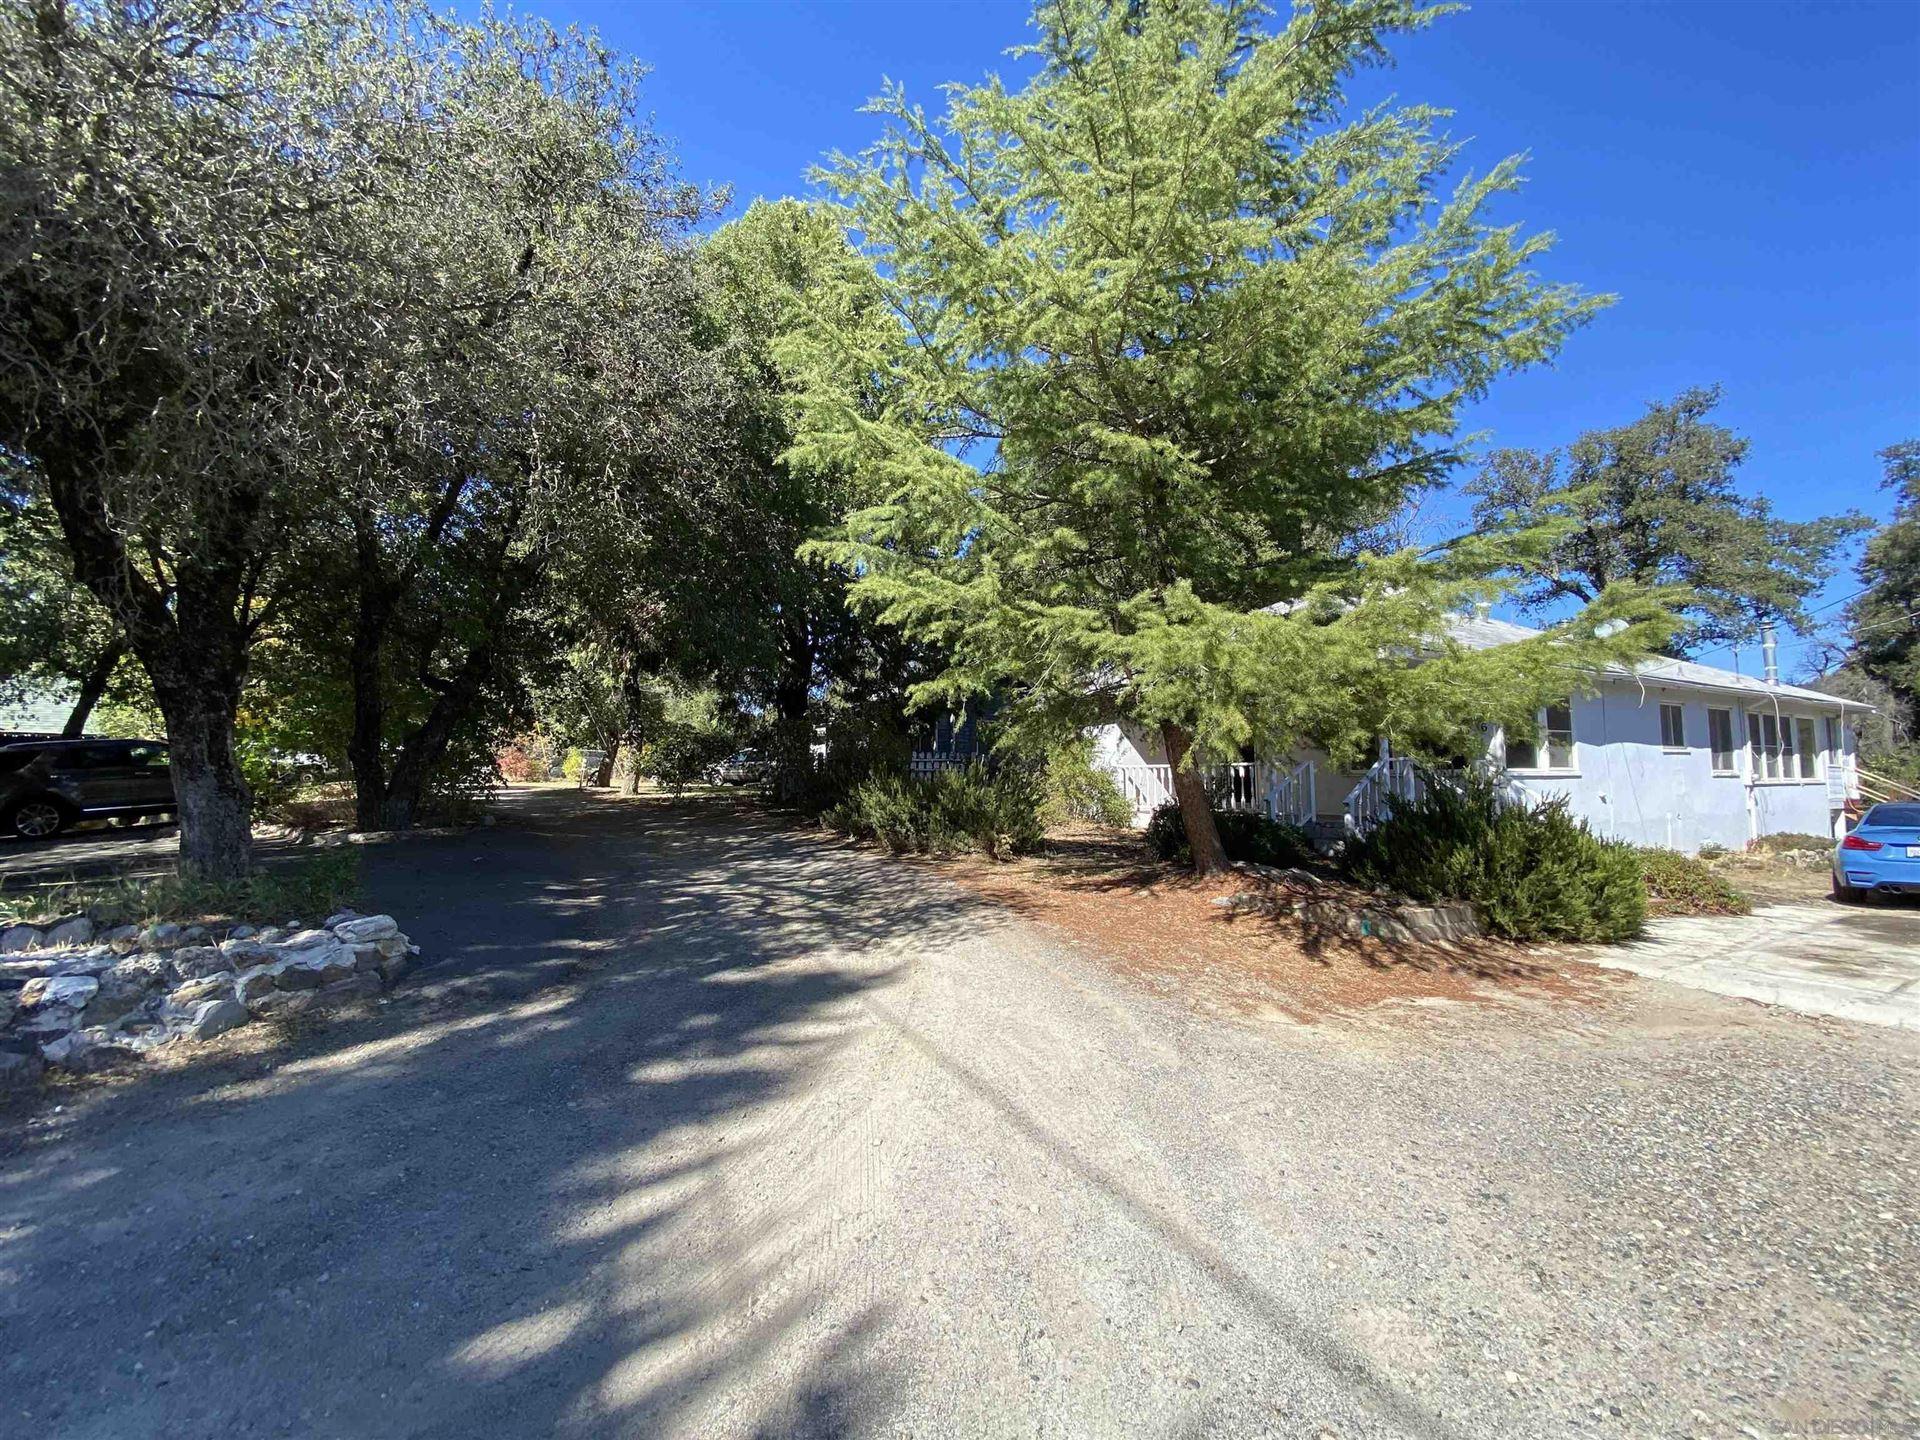 Photo of 1306 Ridge Trl, Julian, CA 92036 (MLS # 210029359)